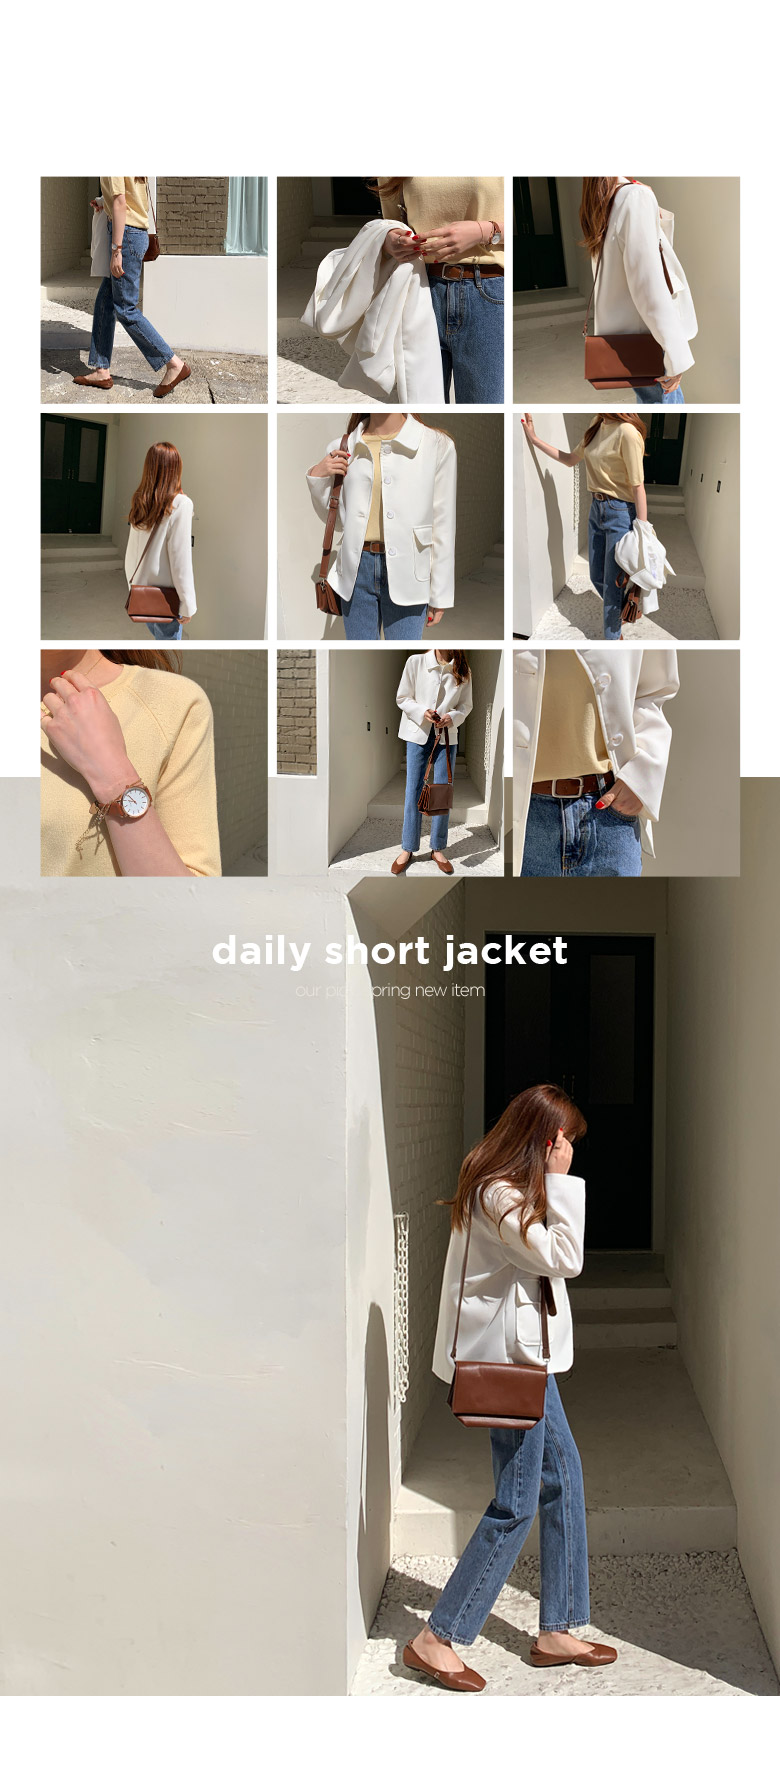 Sounds Daily Short Jacket